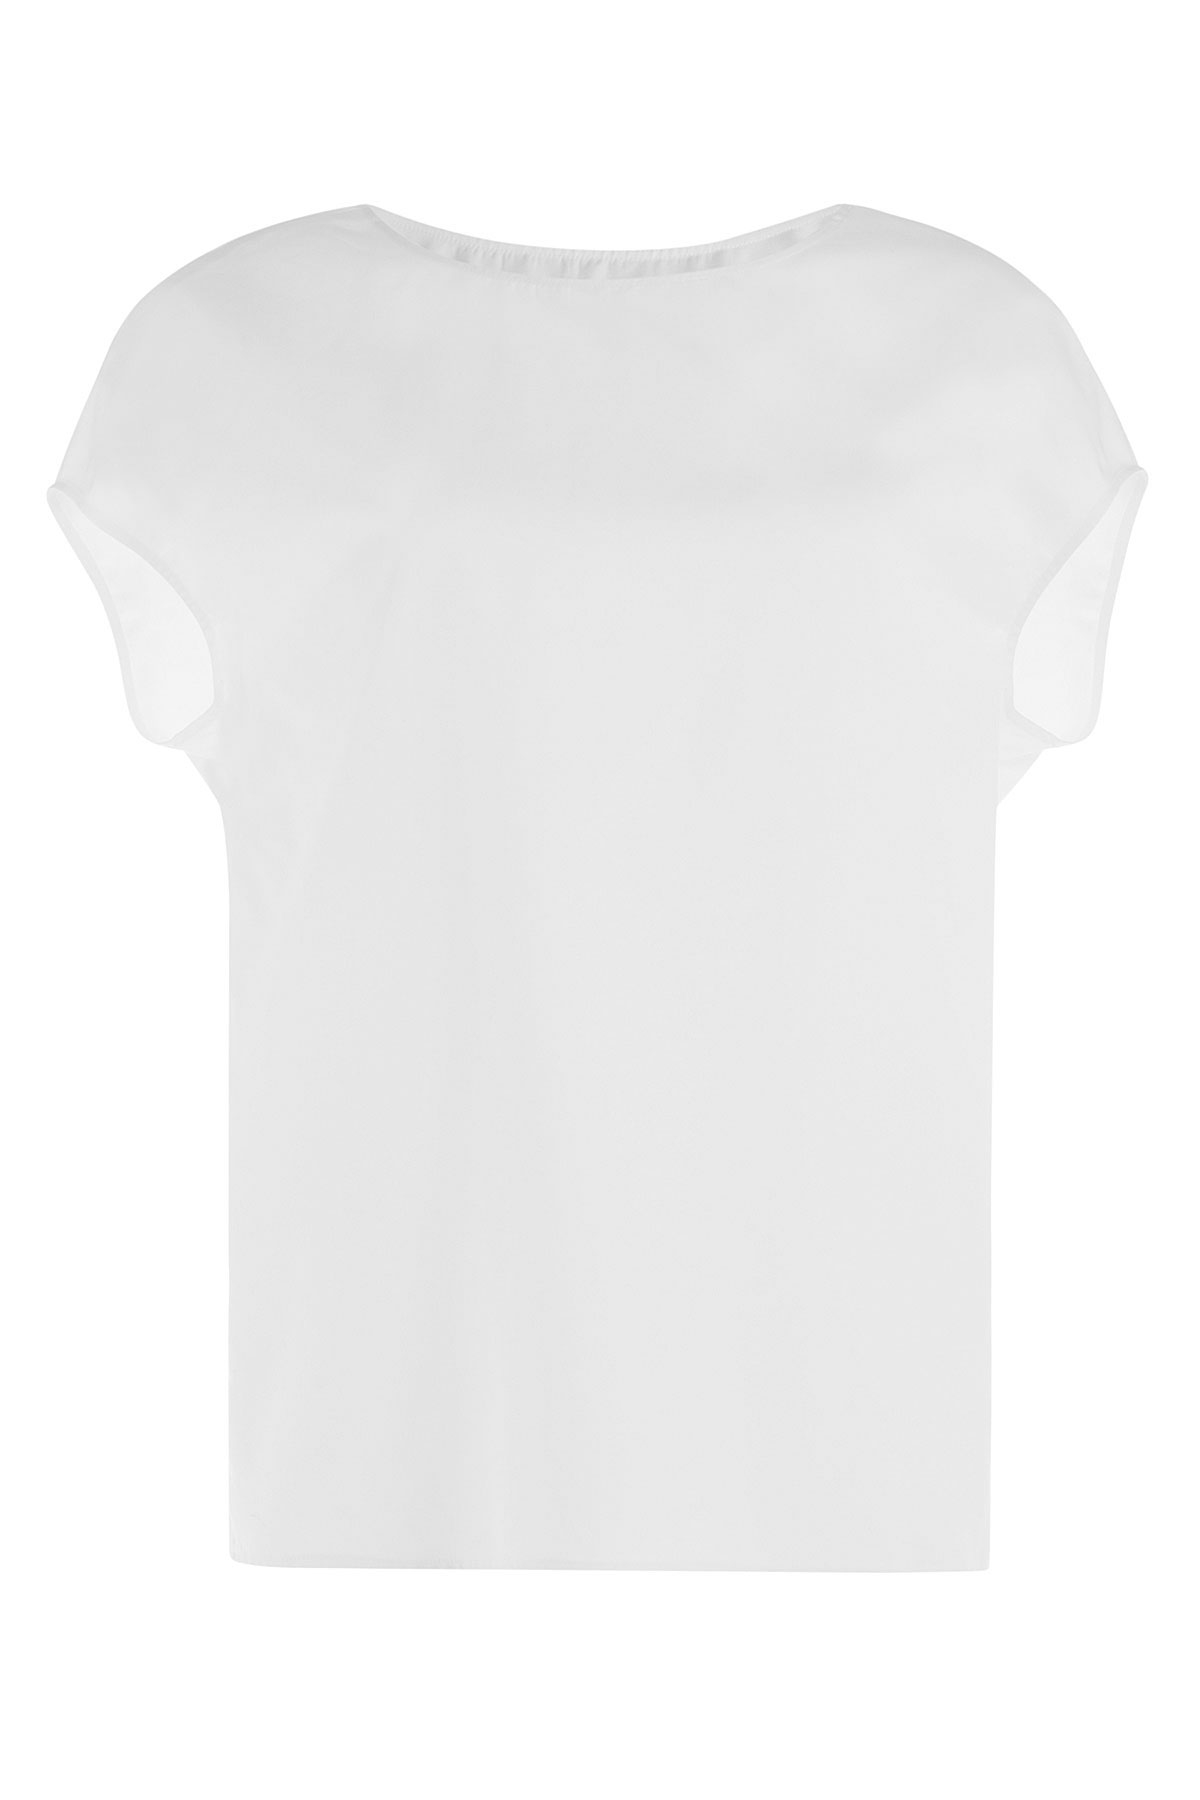 Agnona cotton silk t shirt in white lyst for Cotton silk tee shirts